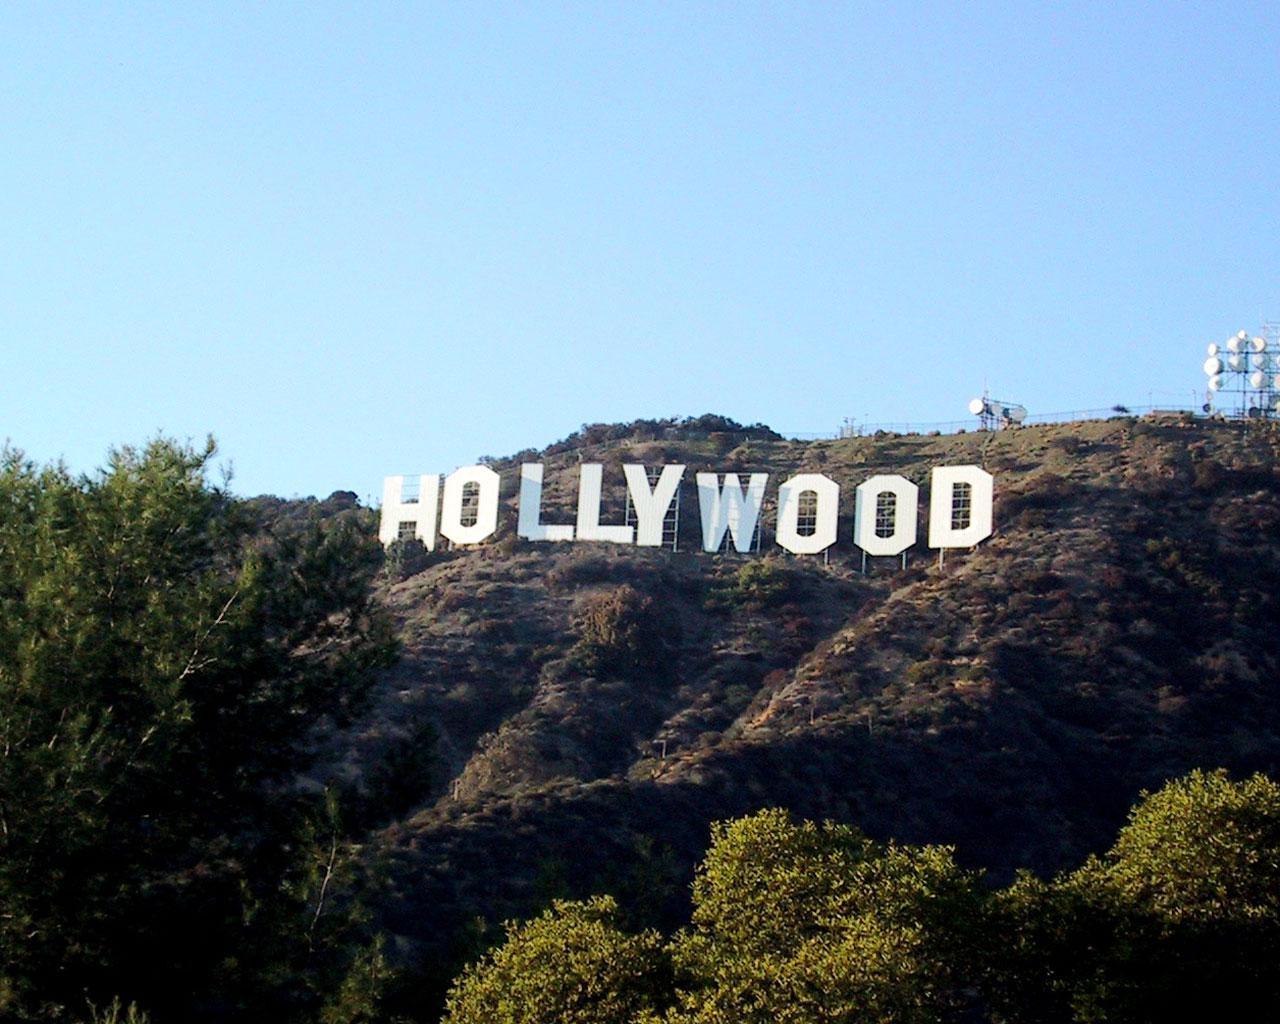 Hollywood Hills Wallpaper 1280x1024